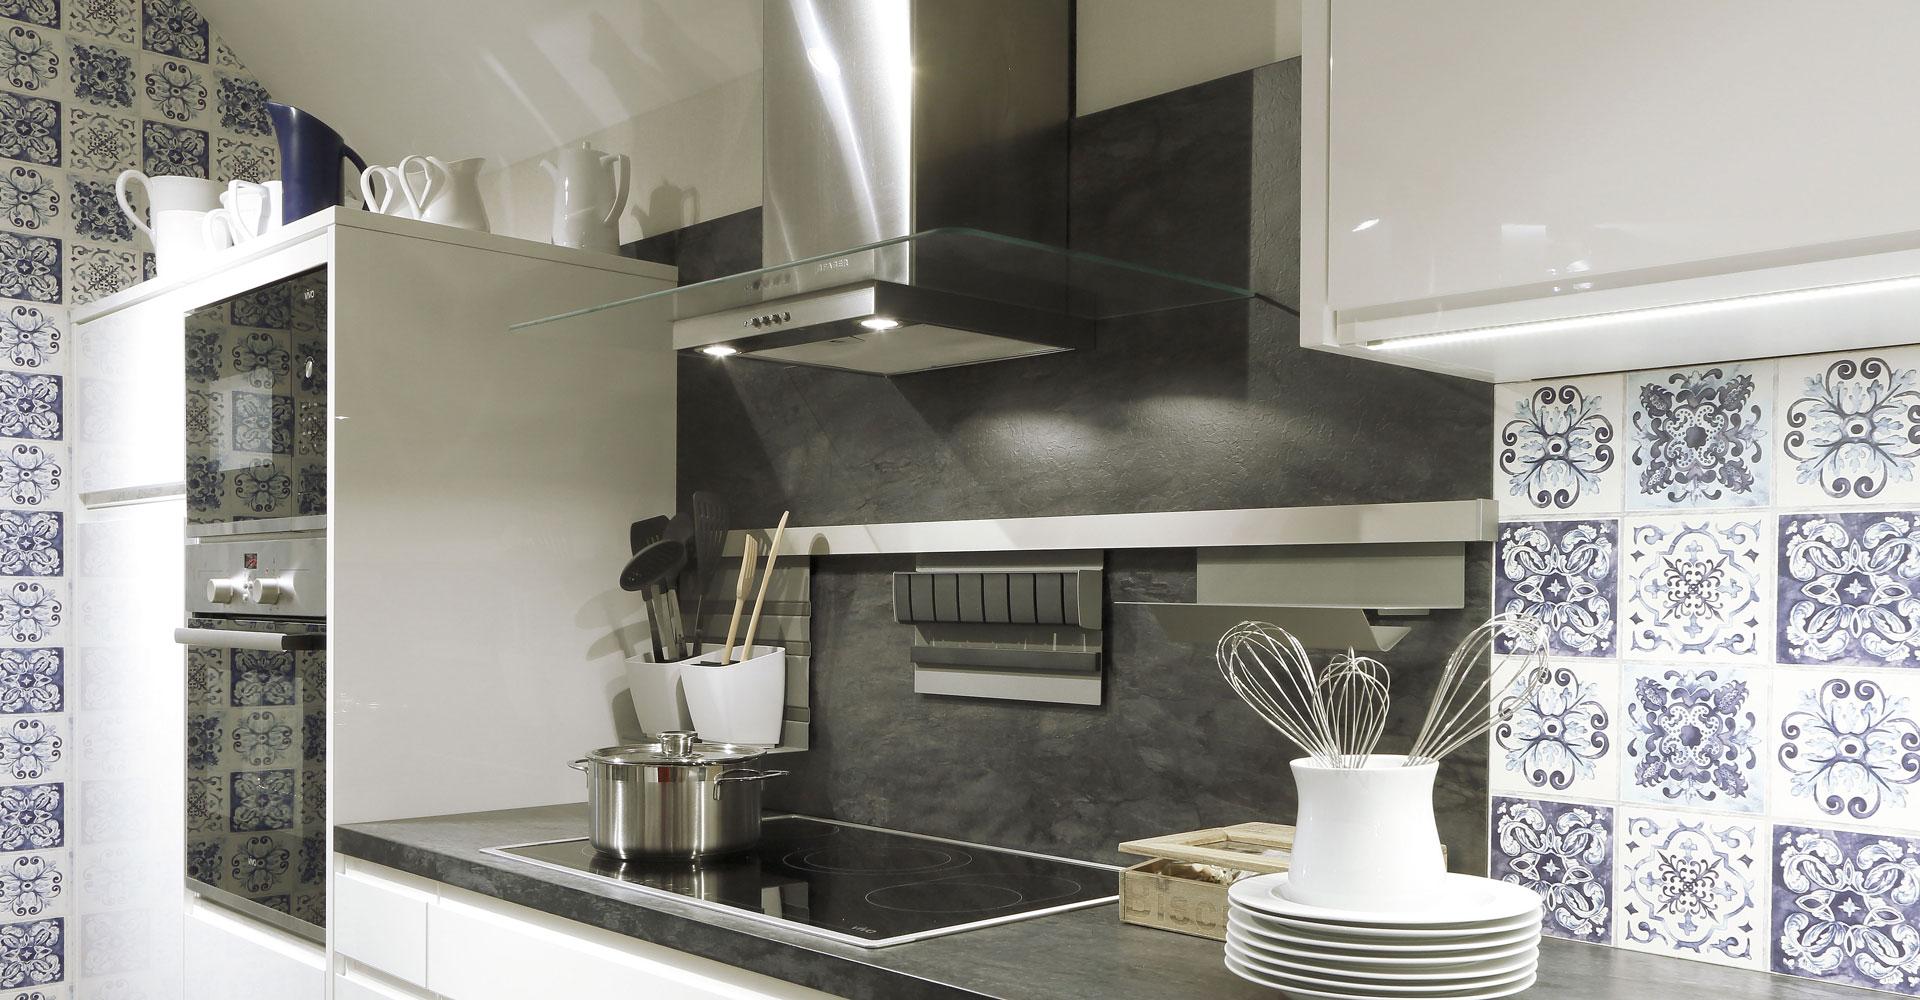 ixina anglet ixina agen cours de cuisine bayonne unique cuisine ikea bleu lgant beautiful. Black Bedroom Furniture Sets. Home Design Ideas